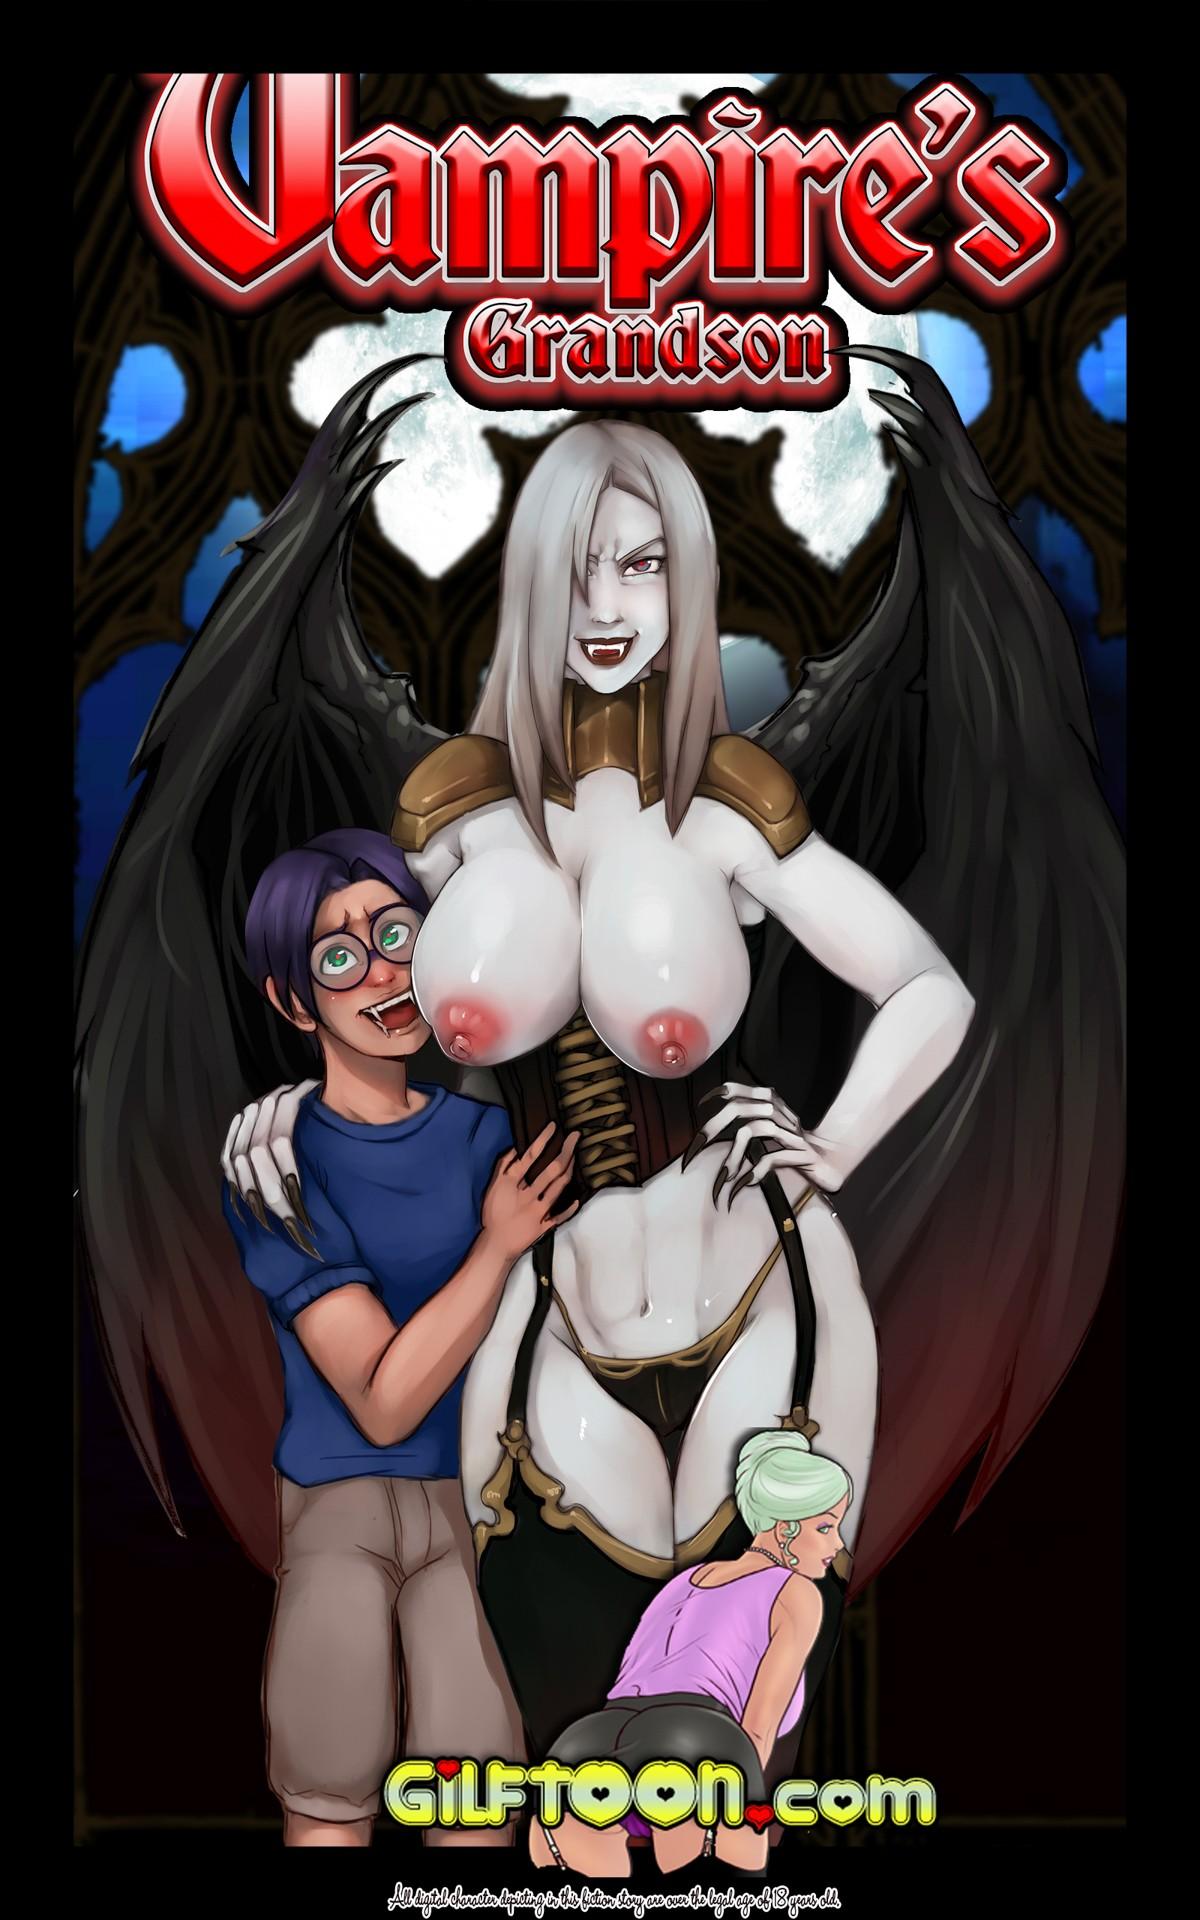 Vampires-Grandson-Gilftoon-01.jpg comic porno